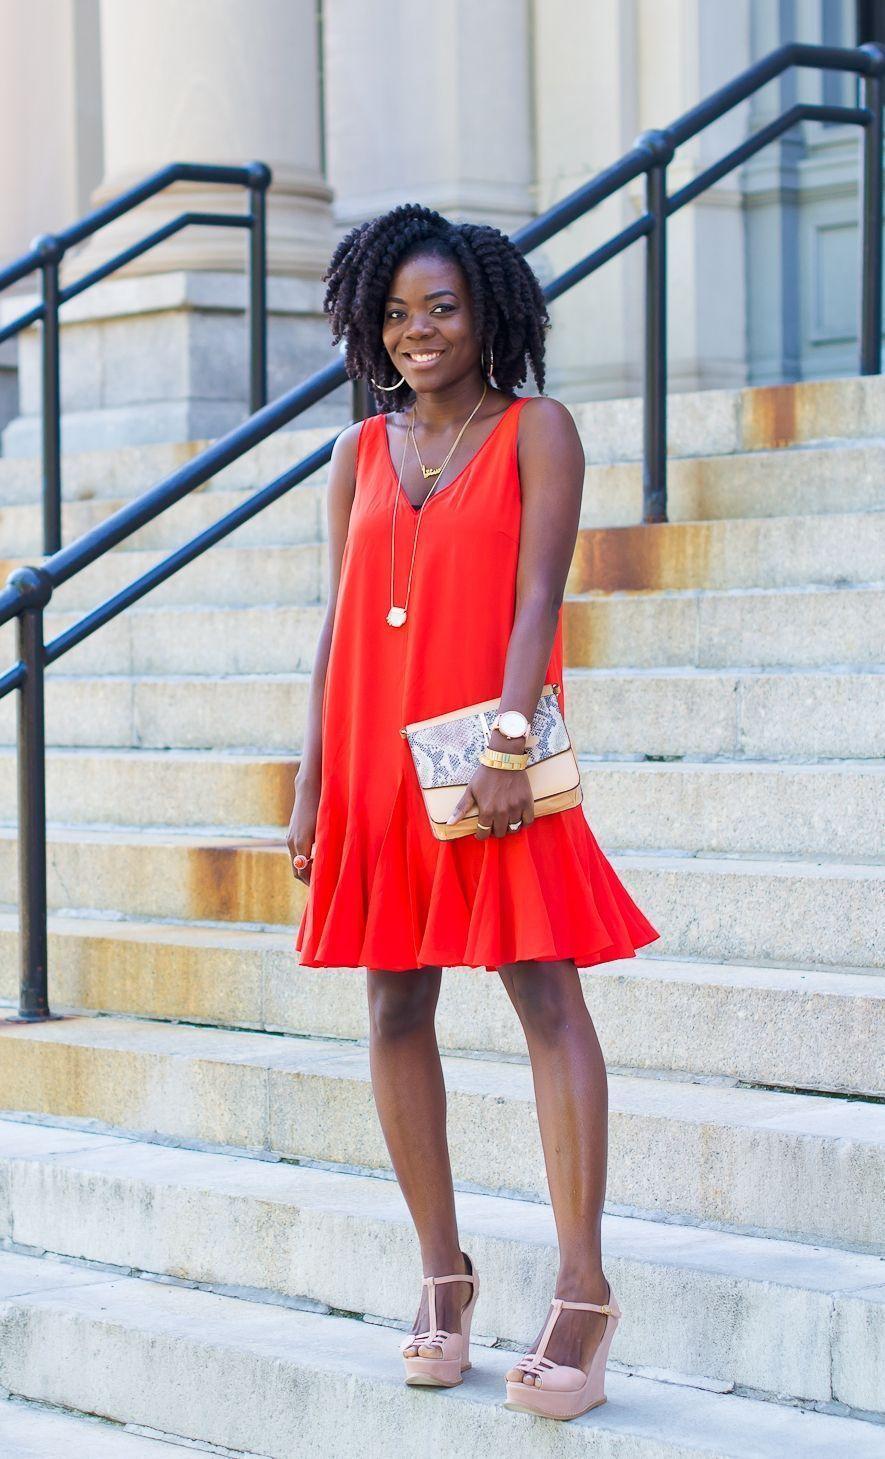 "Foto: Reprodução / <a href=""http://www.simplycyn.com/my-outfits/happy-monday-orange-is-new-black/"" target=""_blank"">Simply Cyn</a>"